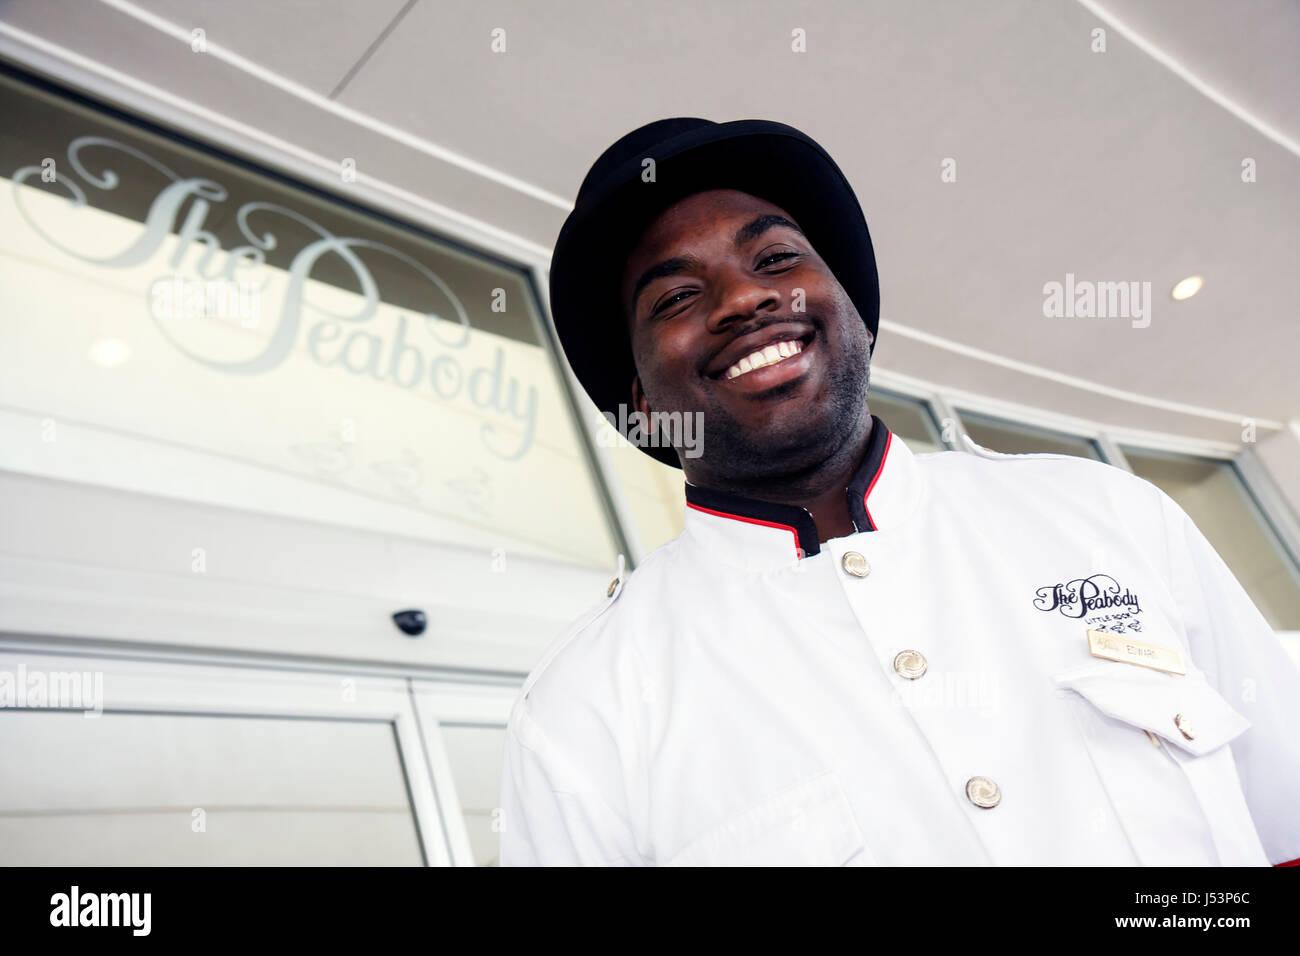 Little Rock Arkansas The Peabody Little Rock hotel Black man porter bellman work job staff door greet customer service - Stock Image